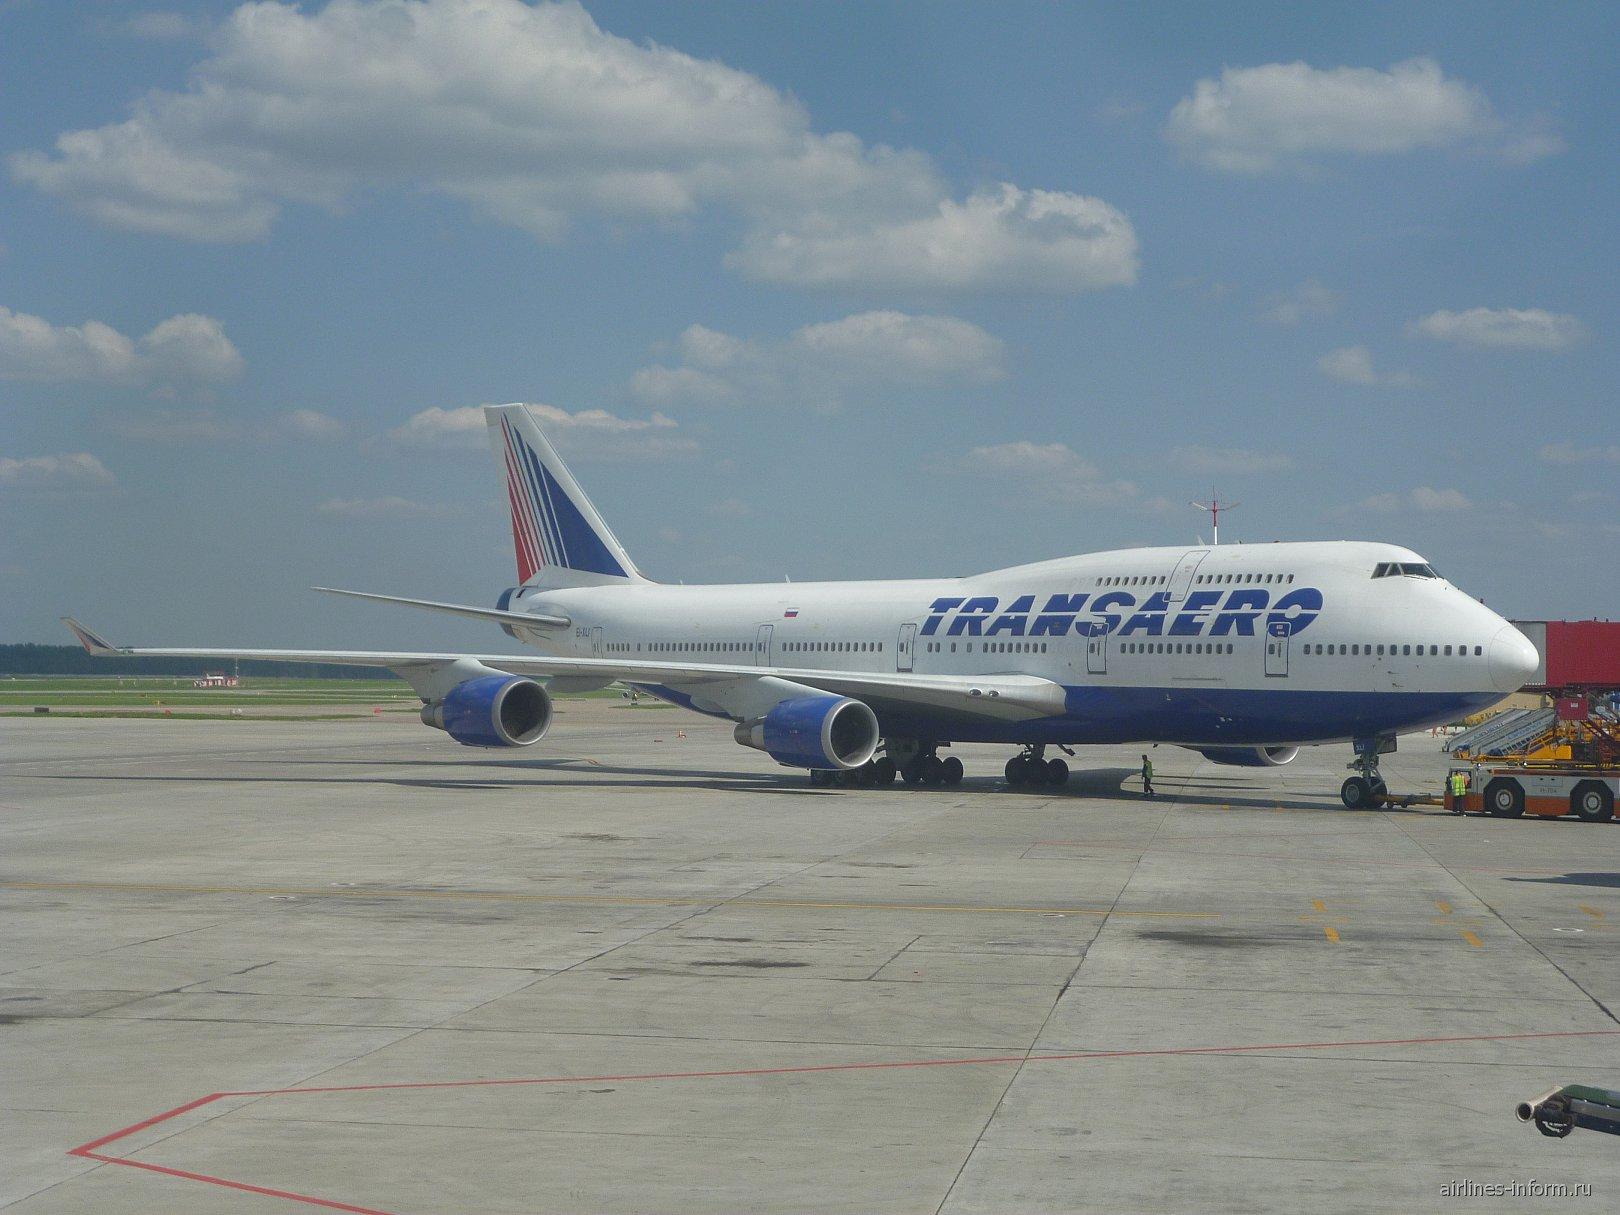 Боинг-747-400 авиакомпании Трансаэро  в аэропорту Шереметьево